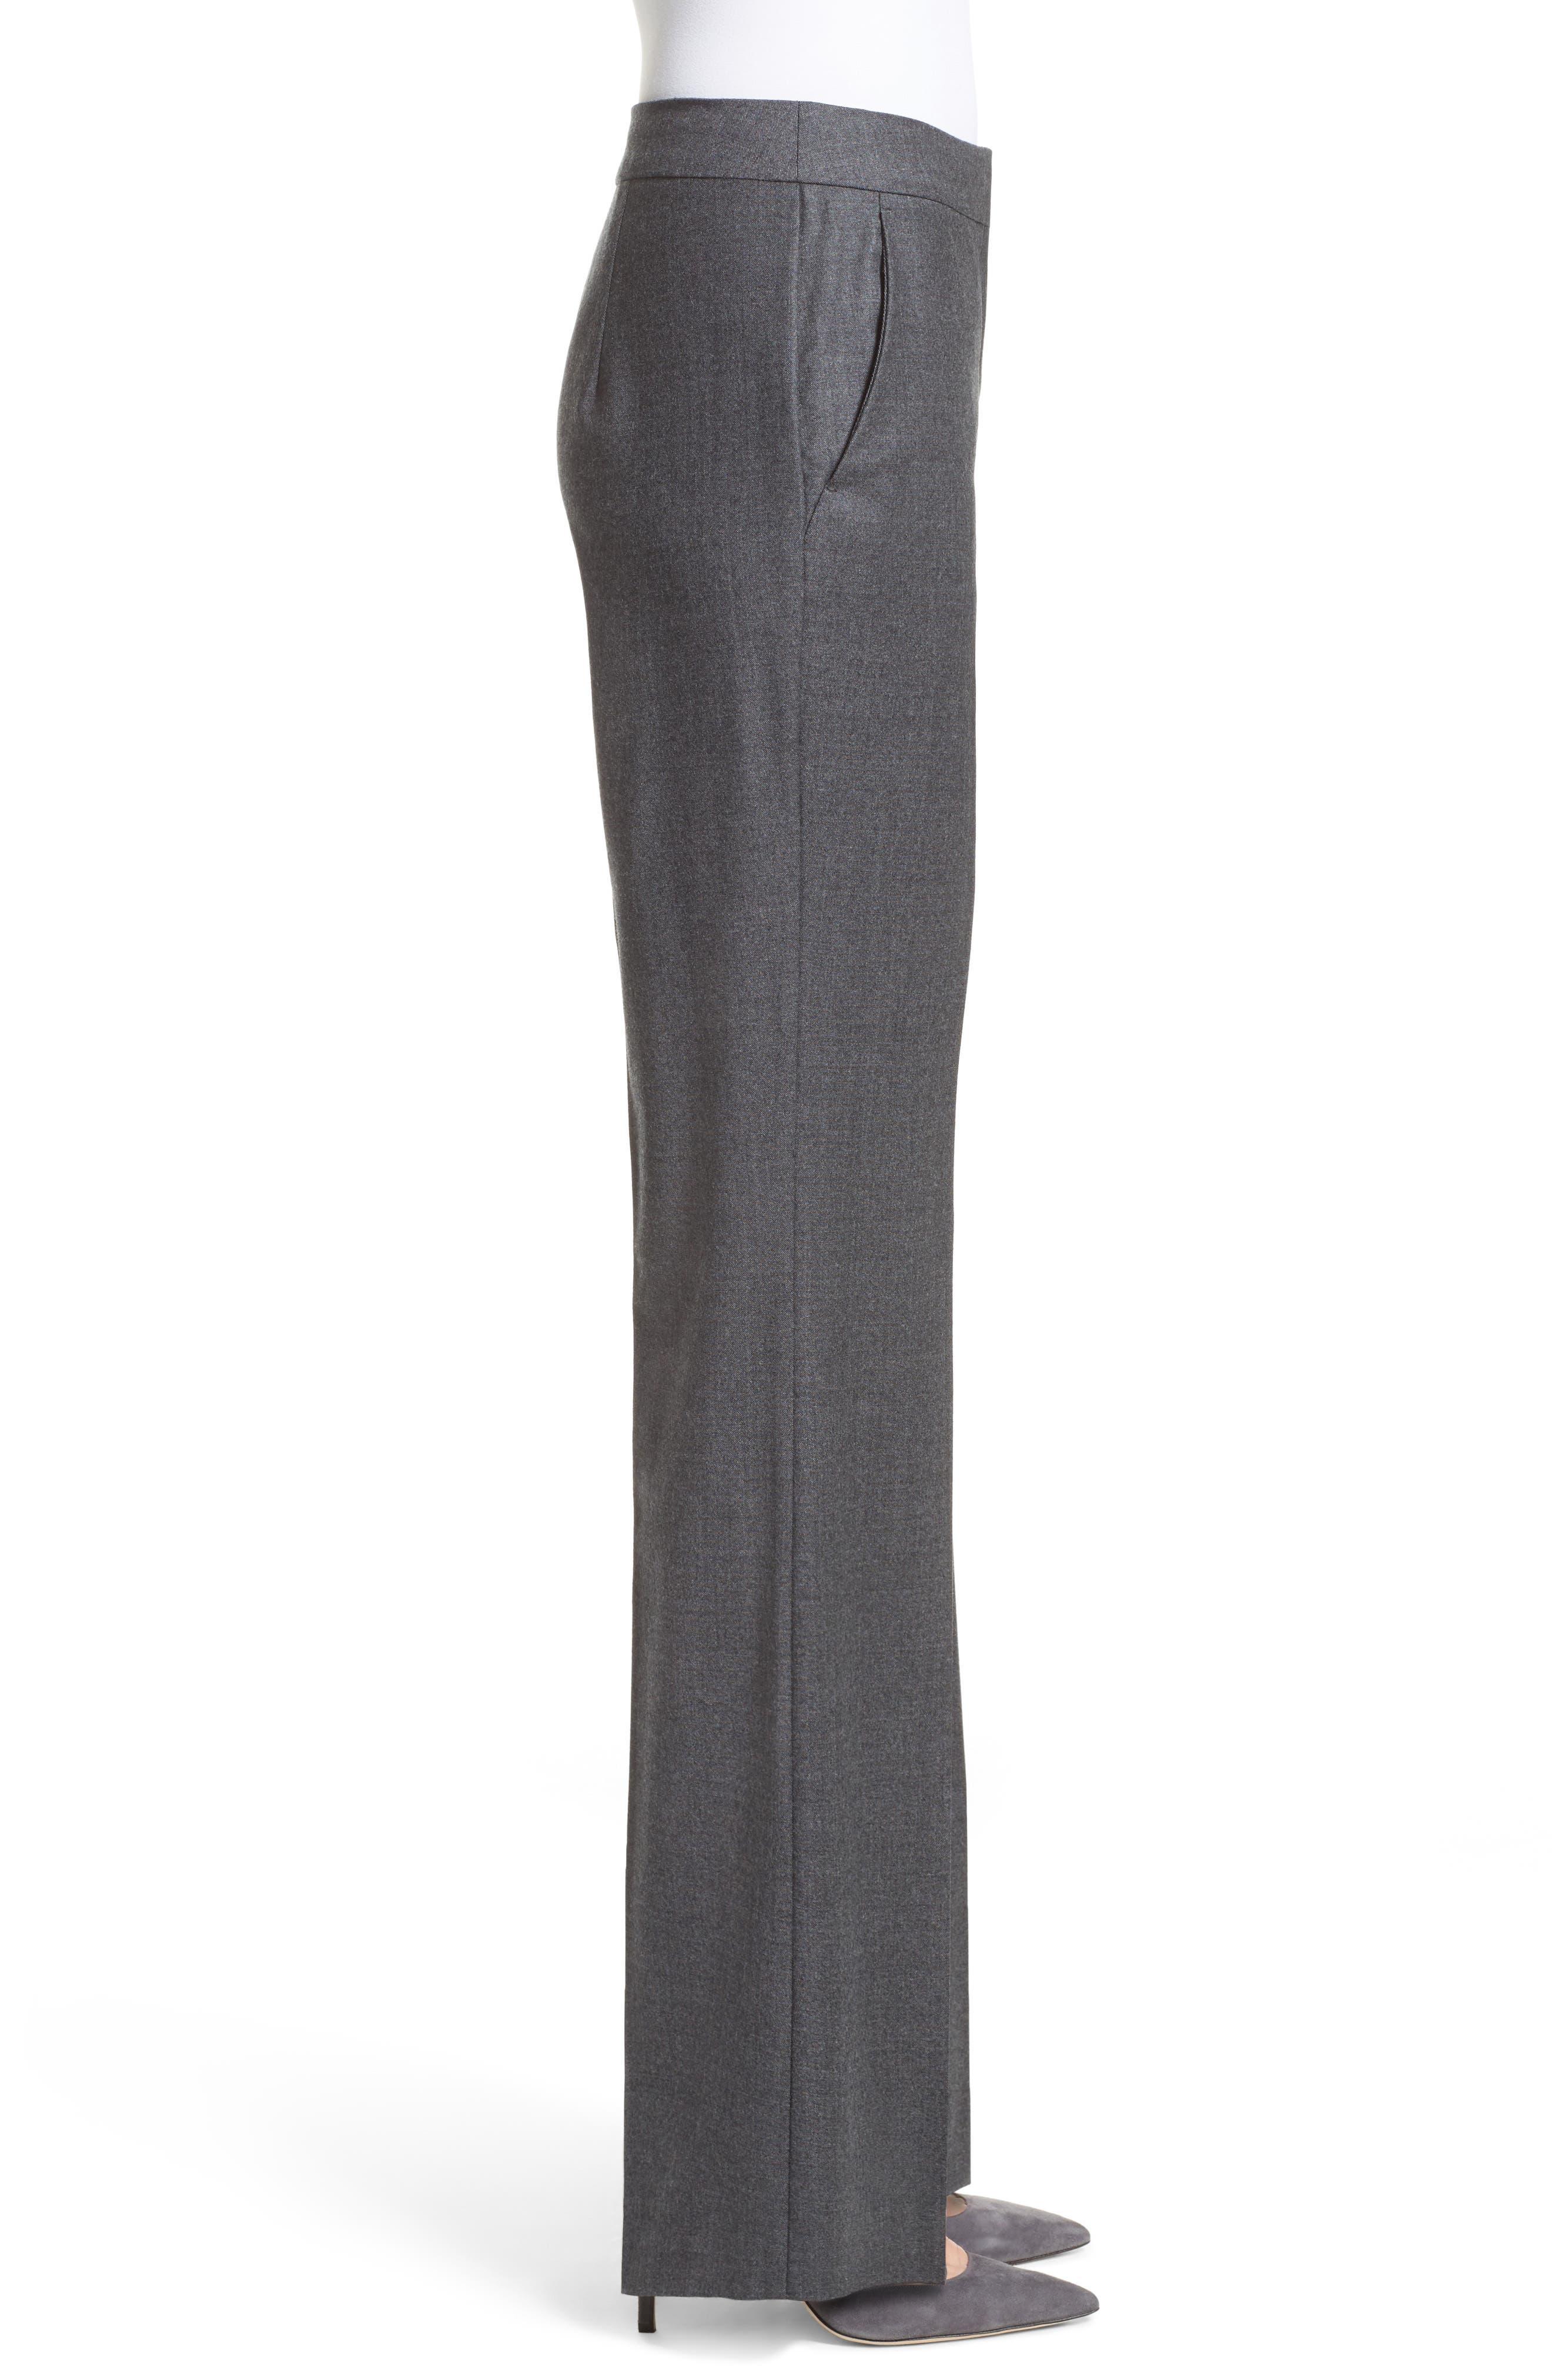 Pedone Wool Pants,                             Alternate thumbnail 4, color,                             Dark Grey